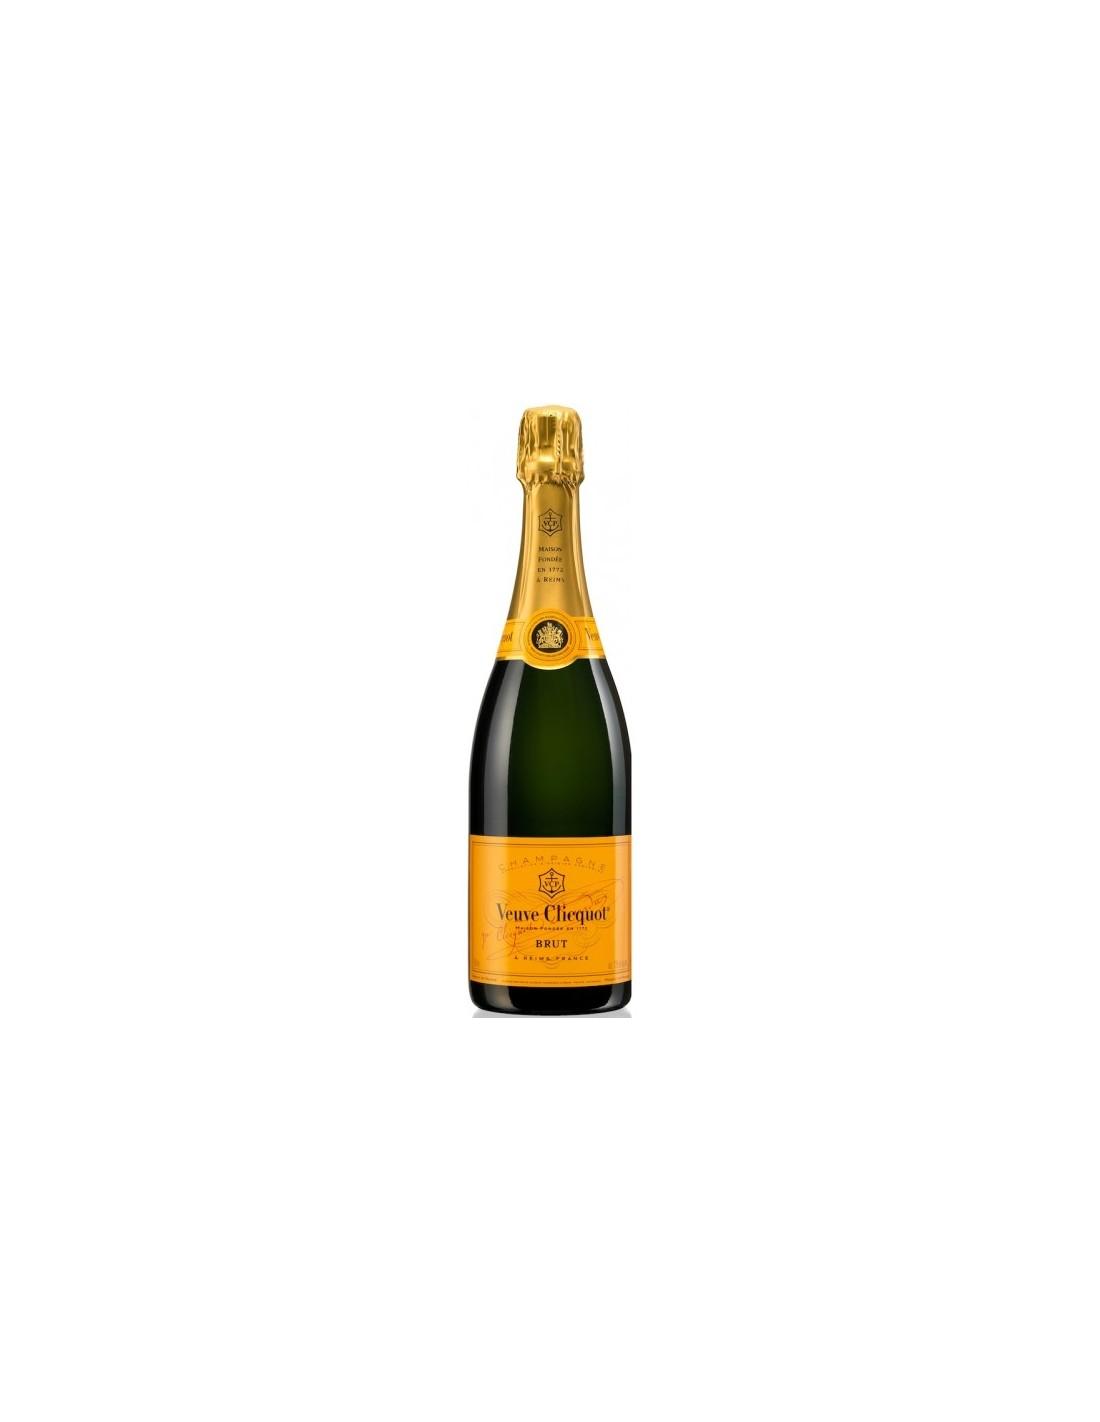 Sampanie, Veuve Clicquot Champagne, 0.75L, 12% alc., Franta